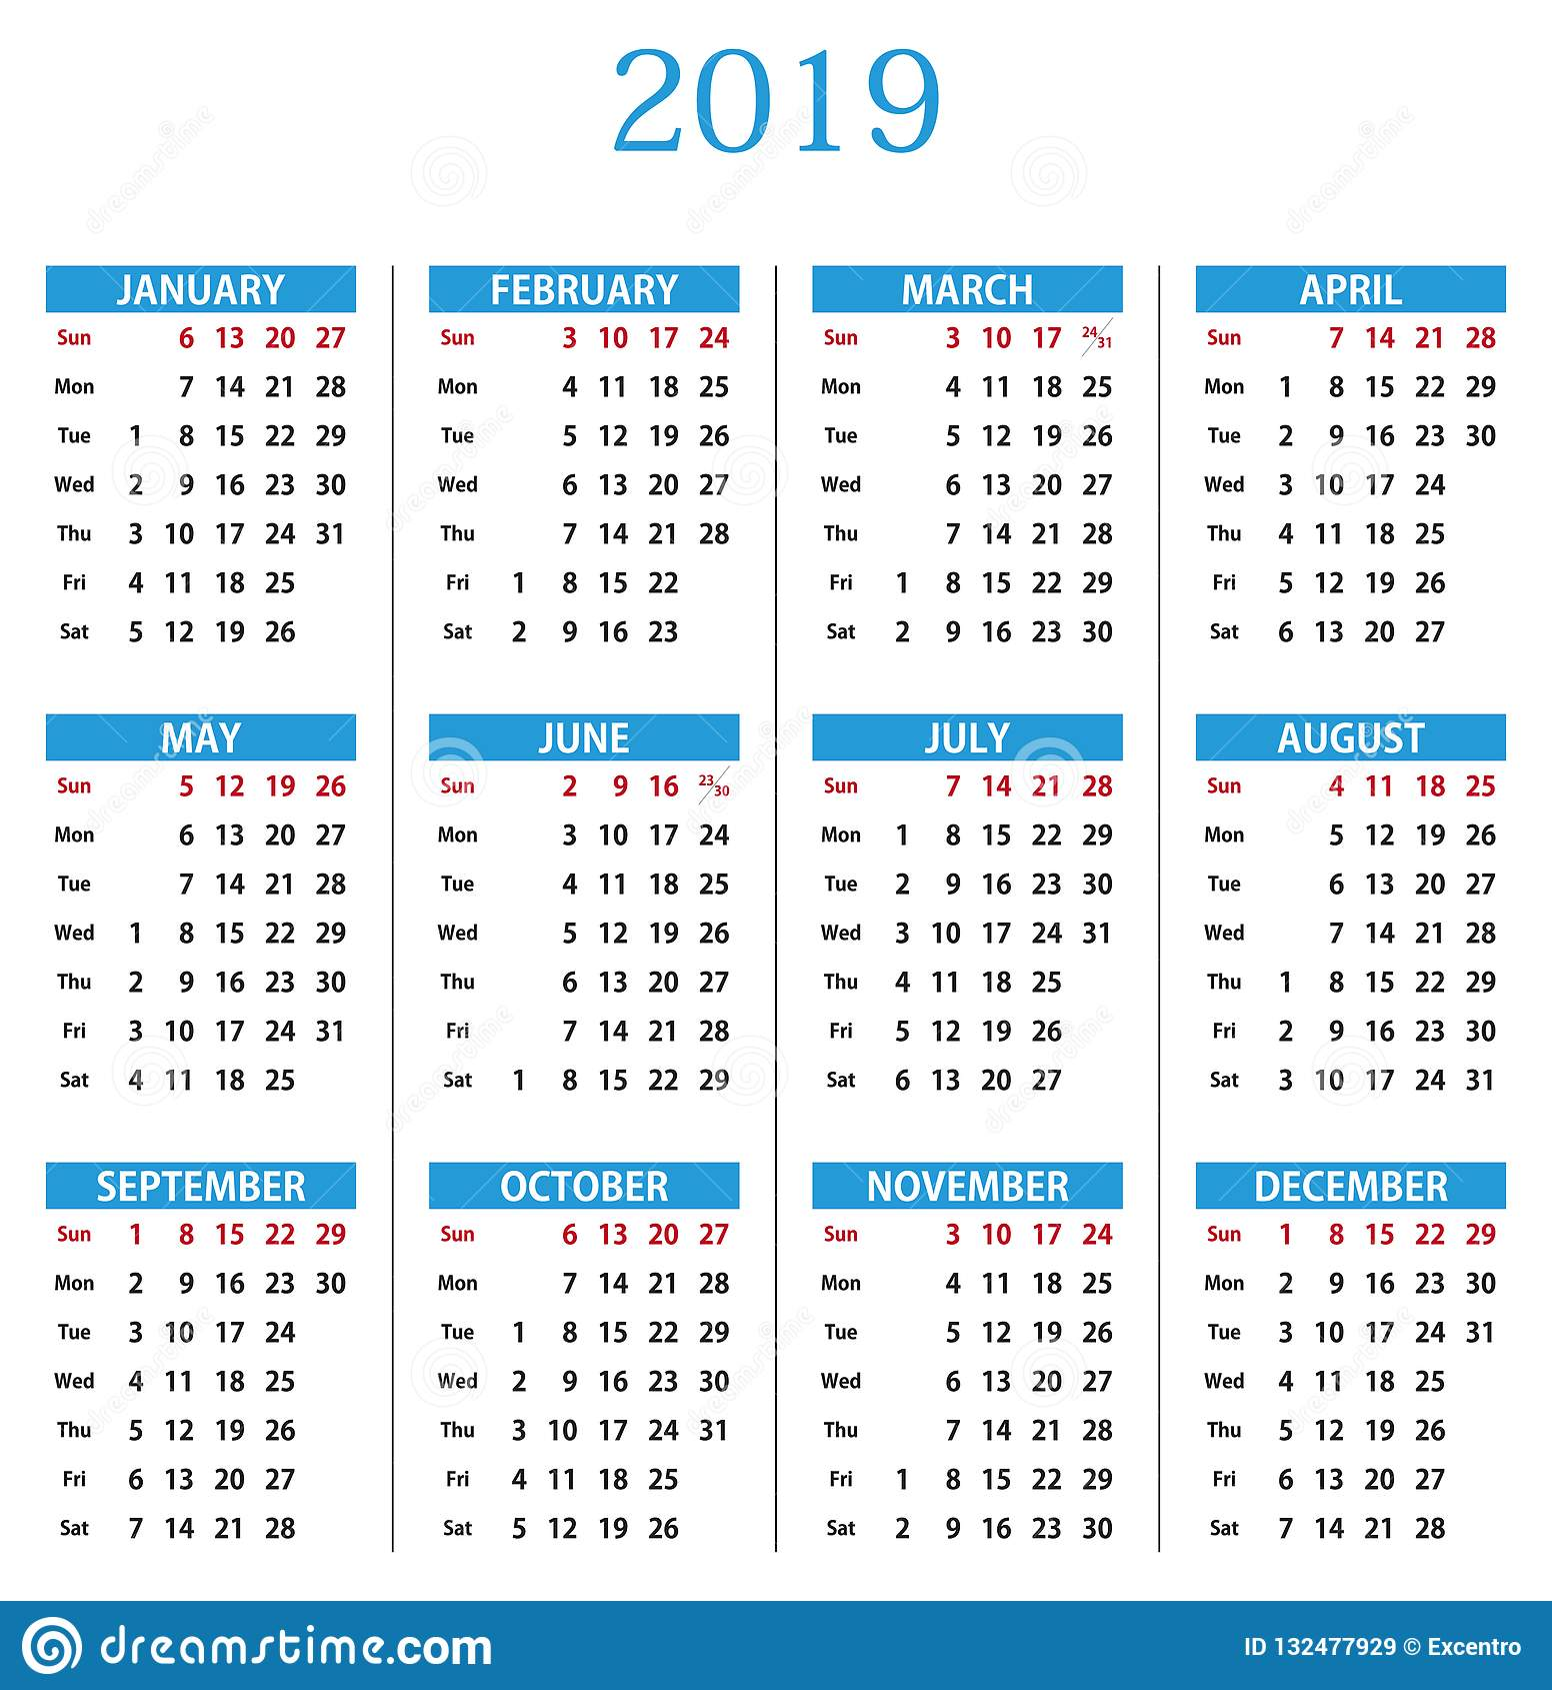 Calendar 2019 Stock Vector. Illustration Of Flower, March